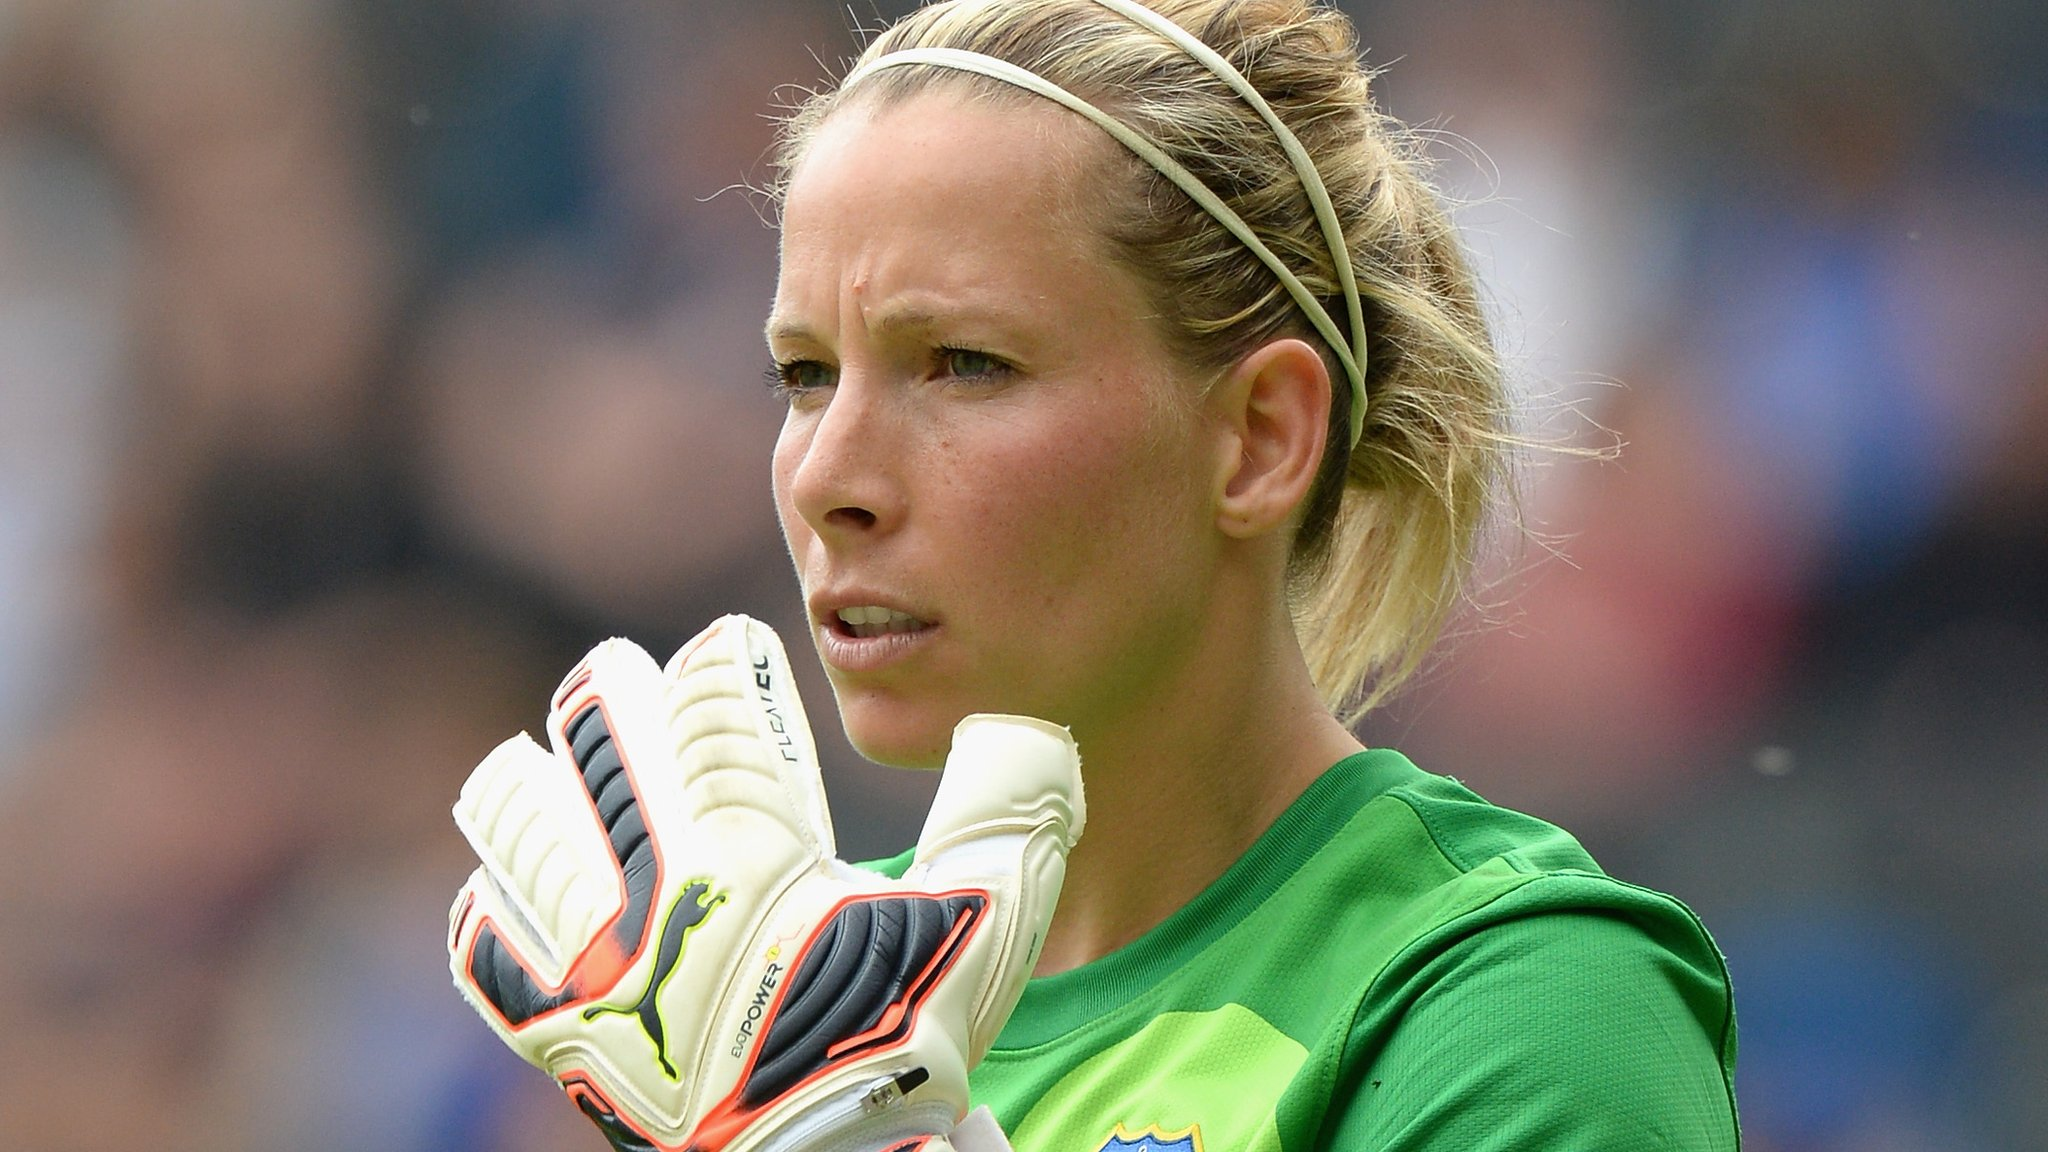 Women's football dragged through mud after Sampson sacking - Brown-Finnis